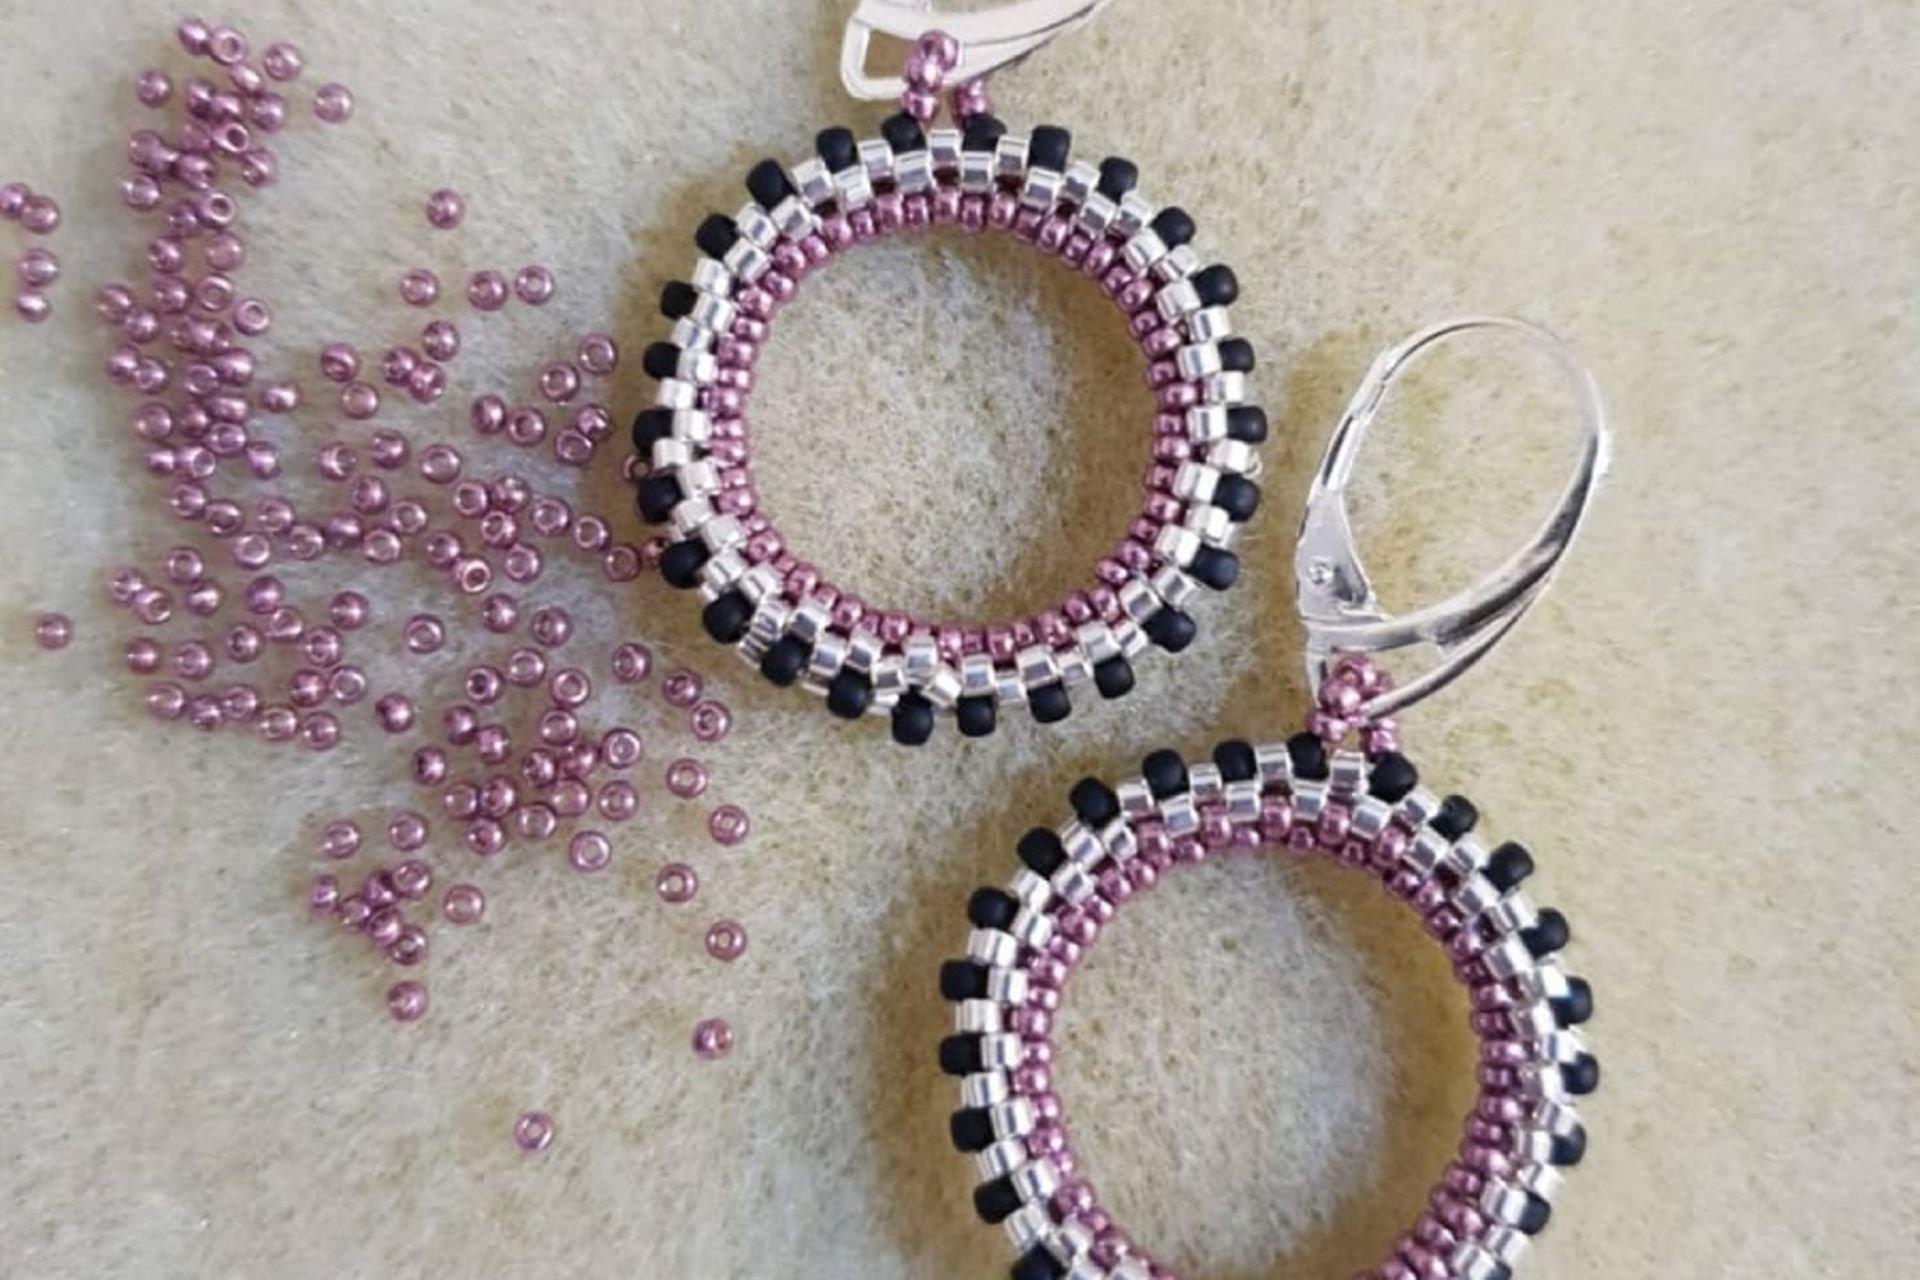 9 lantana beads jewelry designer תְמוּנָה